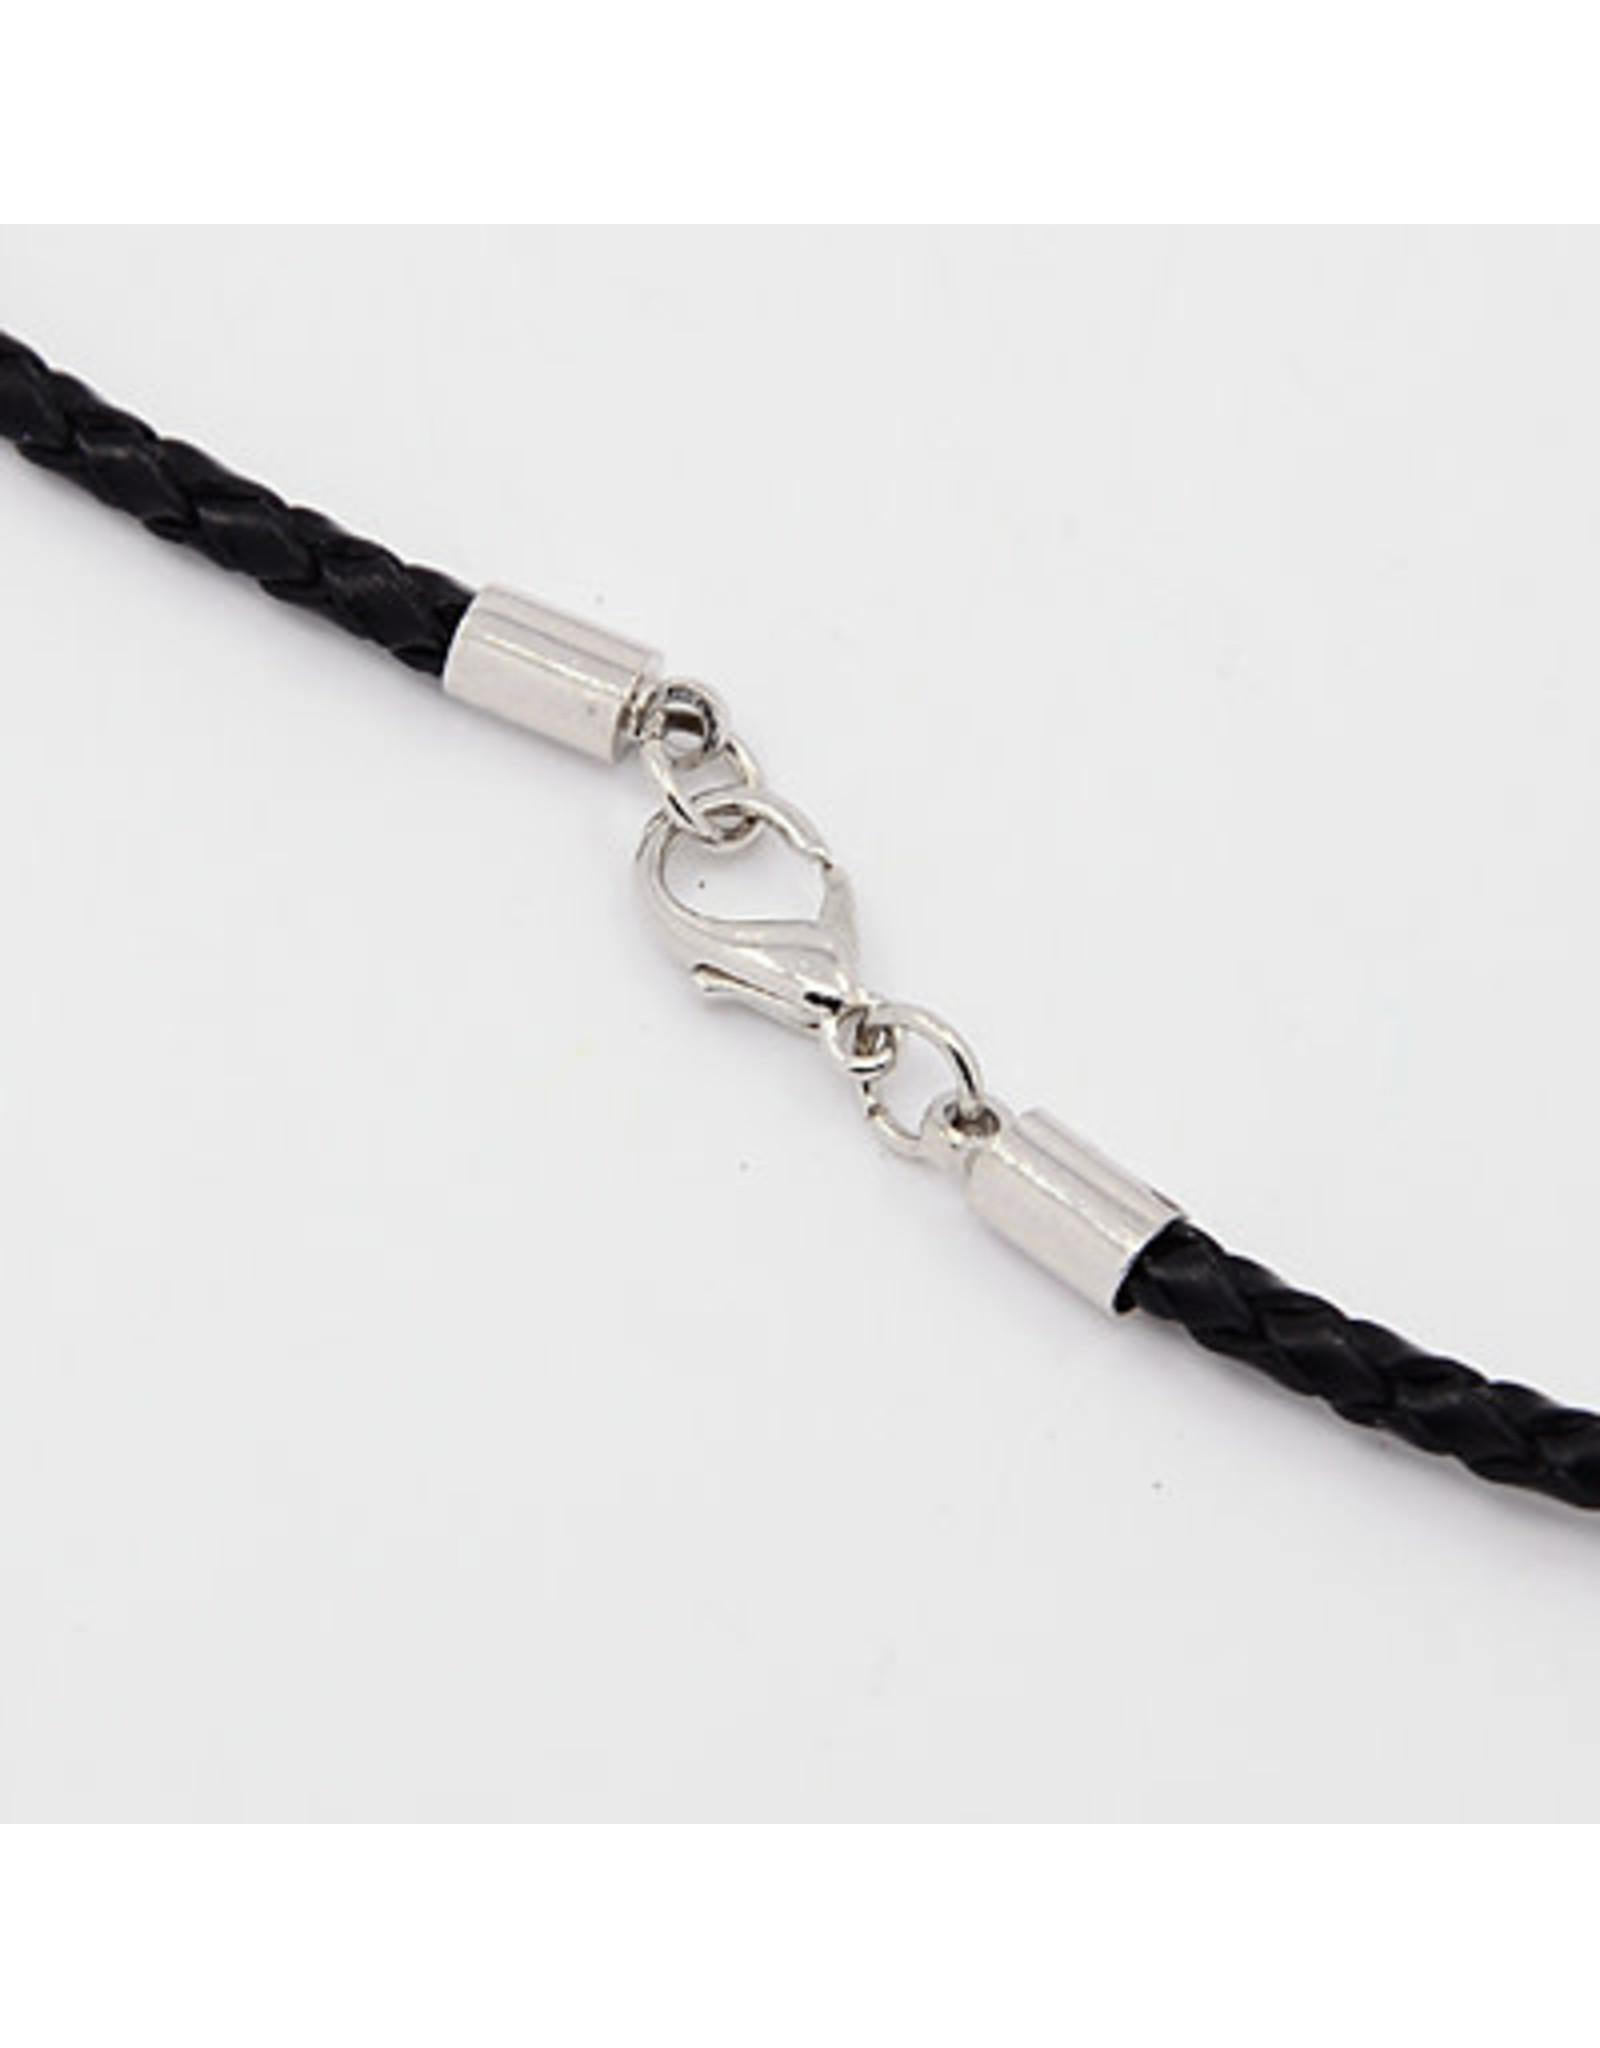 "Leather Cord Braided  3mmx18"" Black  x1"